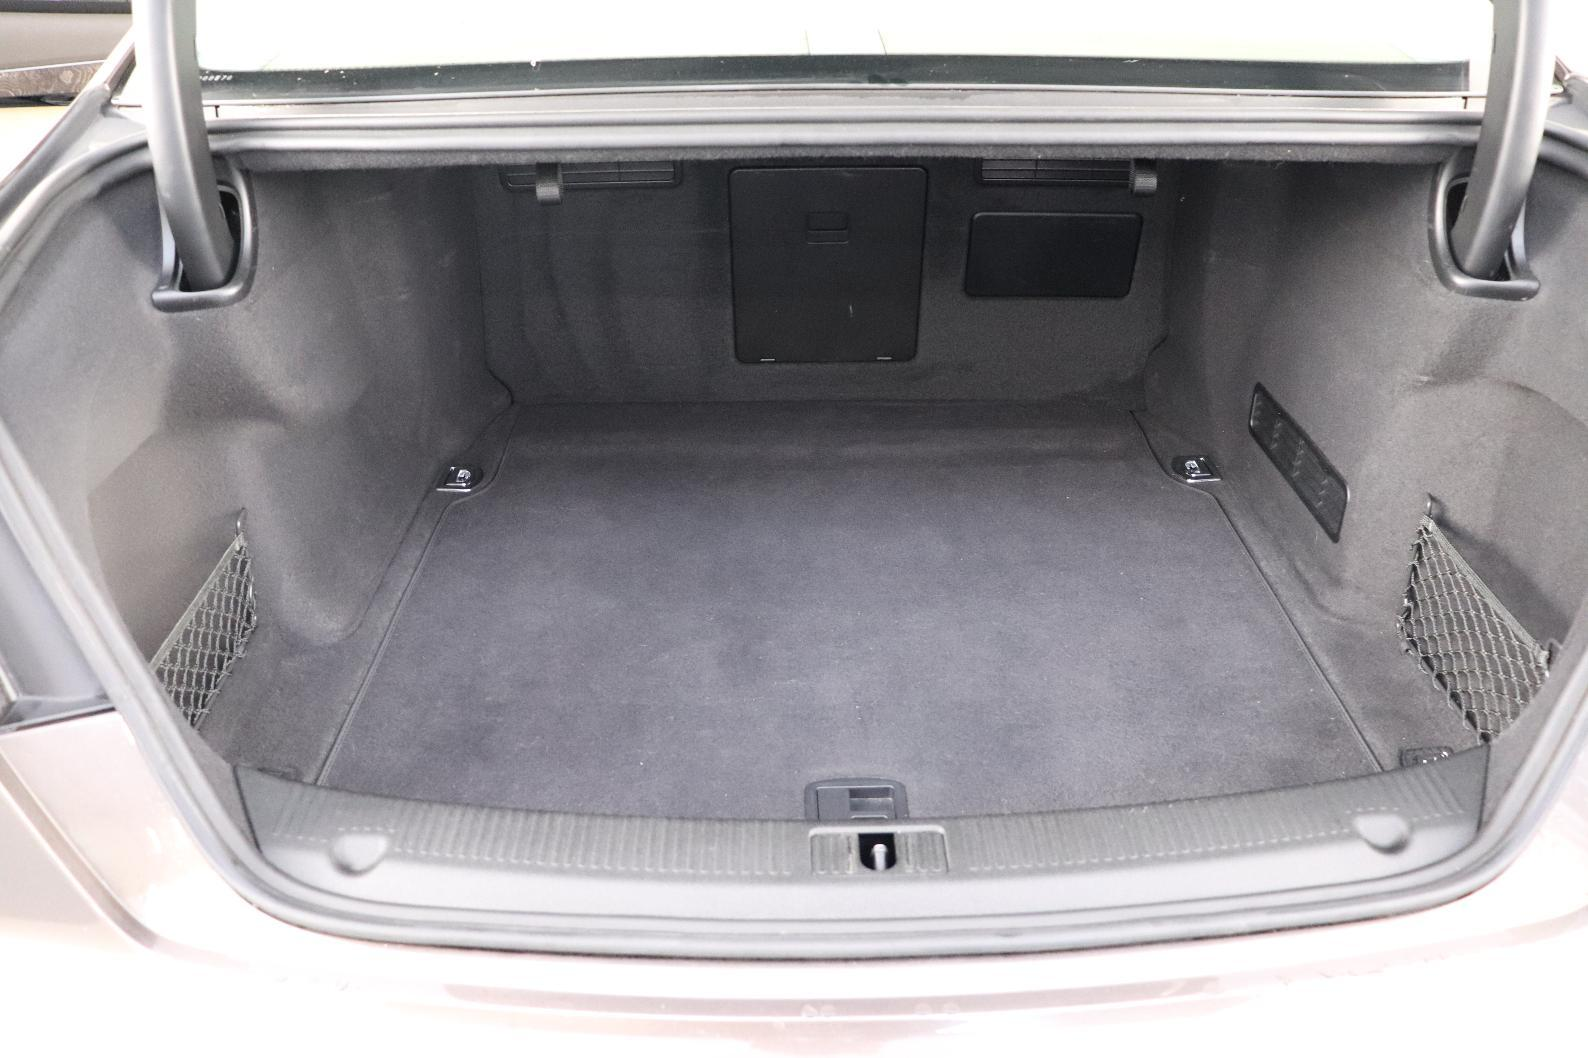 AUDI A8 V6 3.0 TDI 262 DPF Clean Diesel Tiptronic 8 Quattro Avus